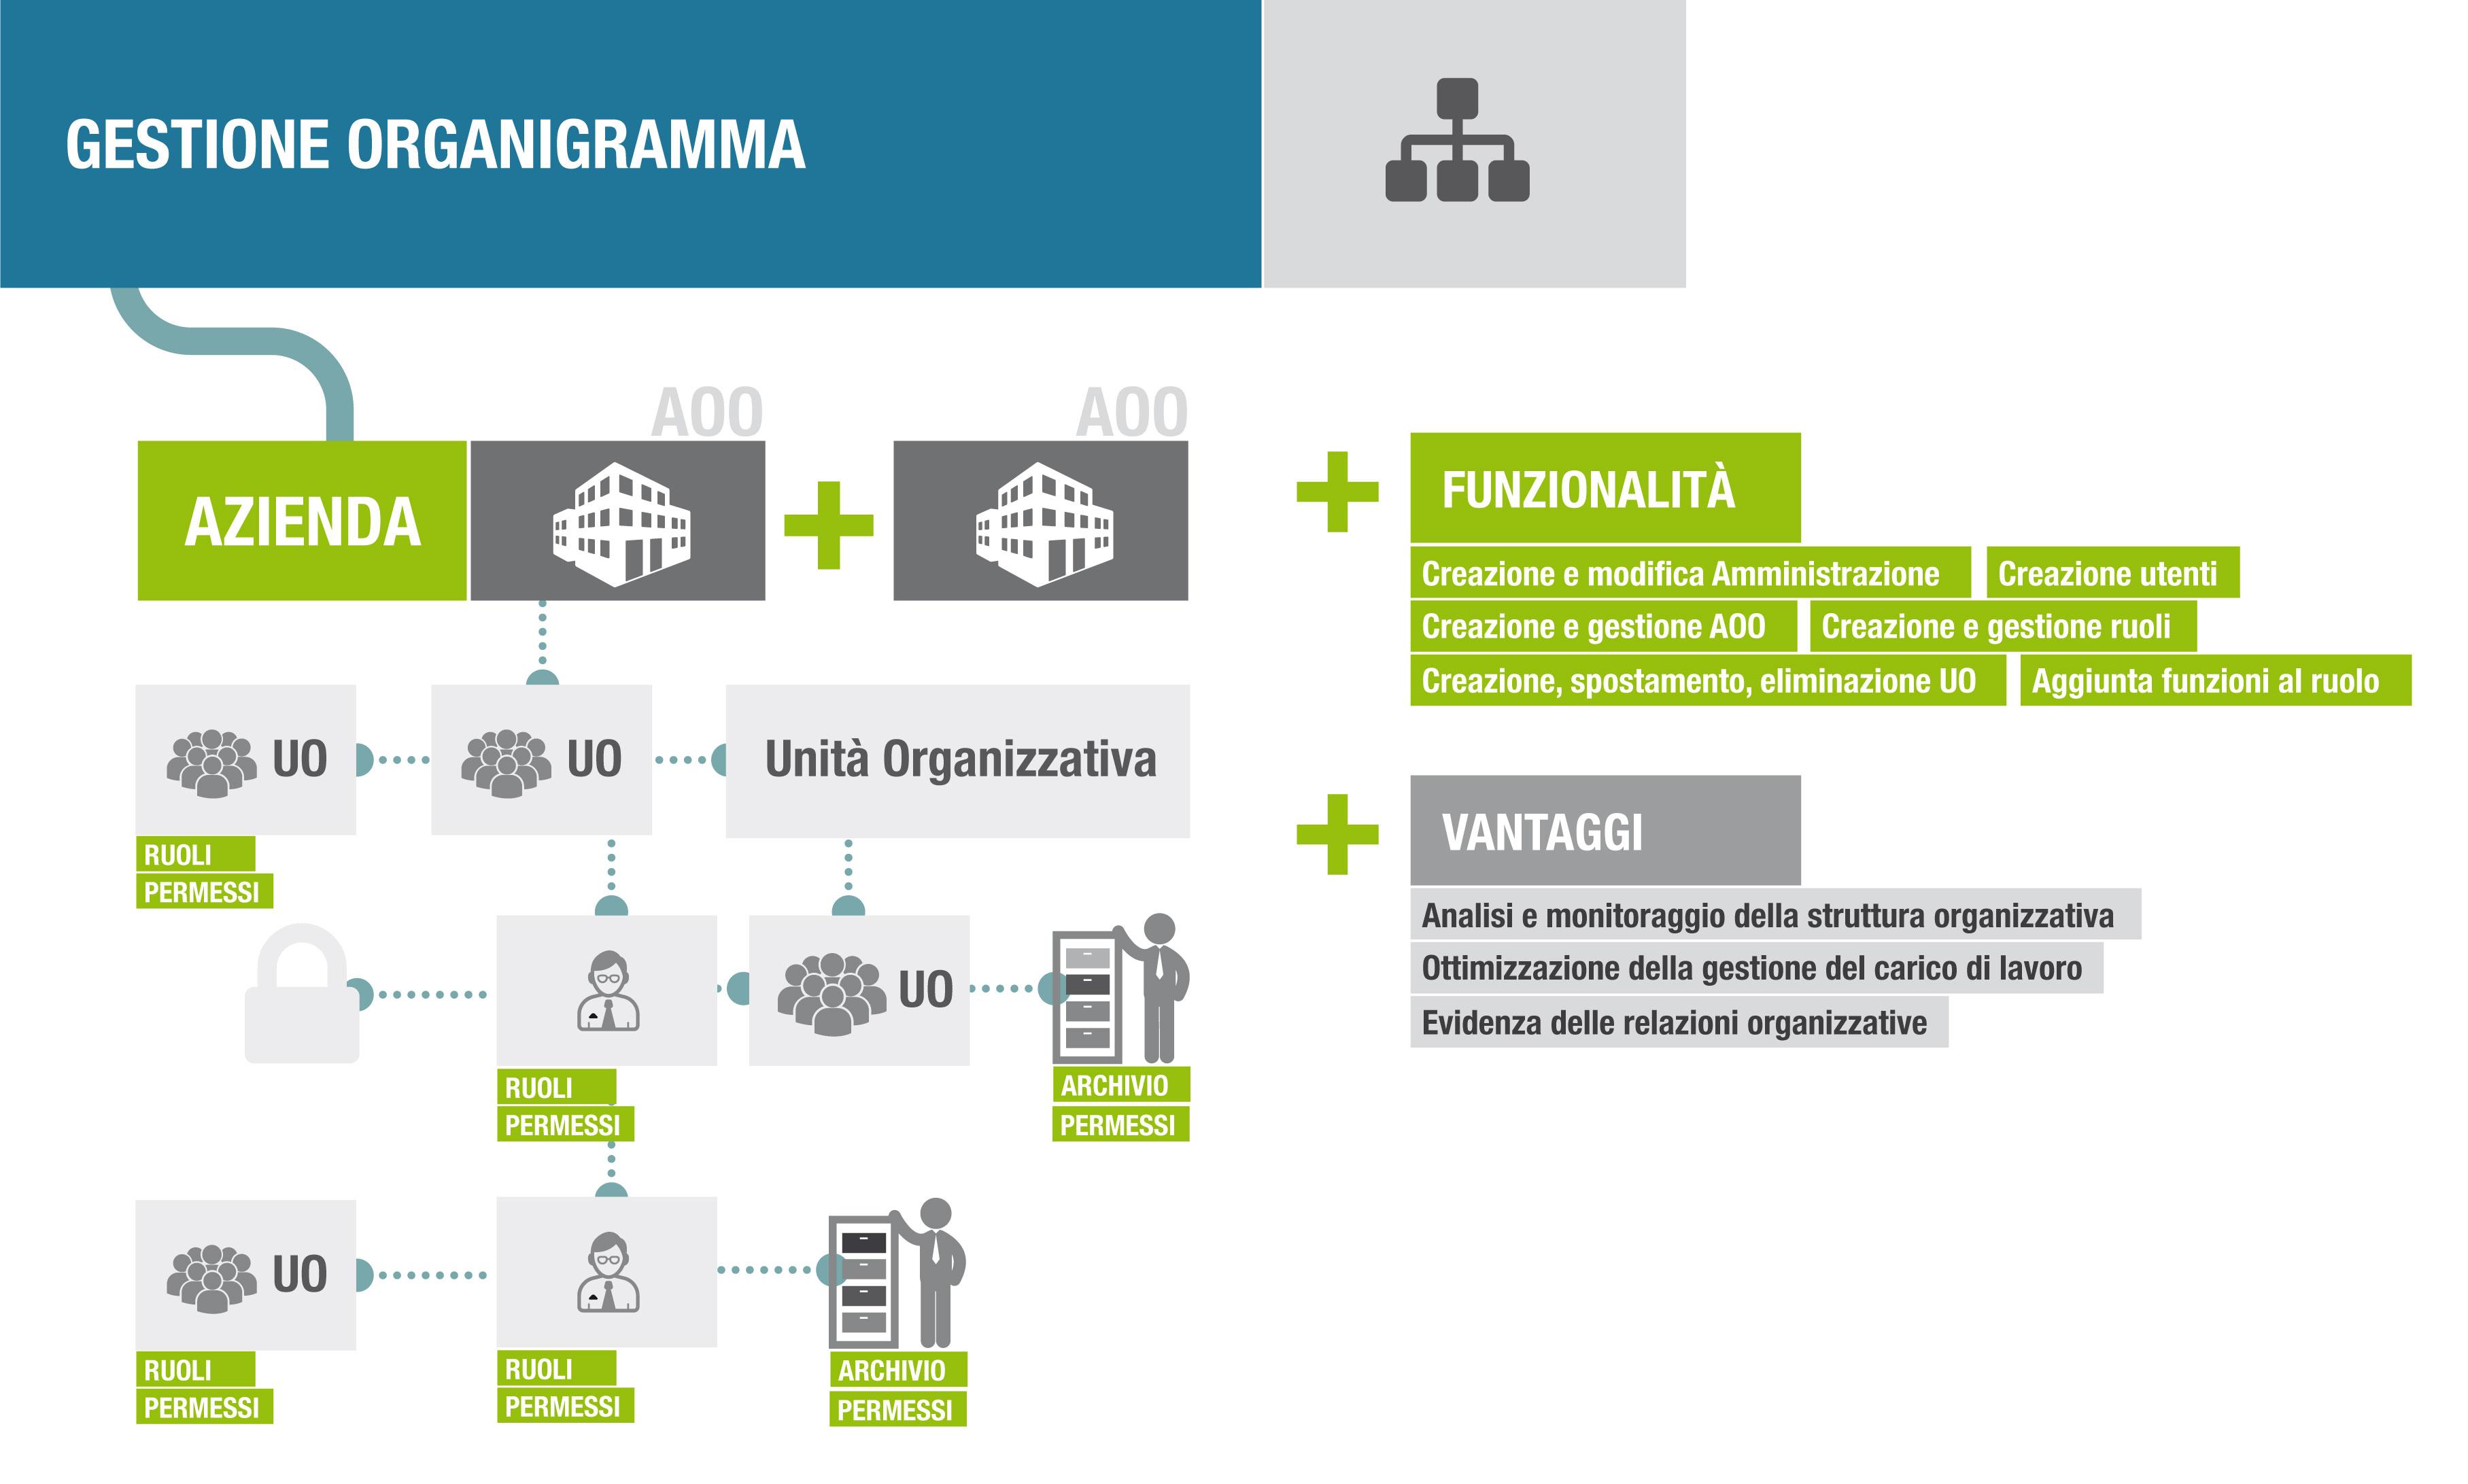 infografica-gestione-organigramma